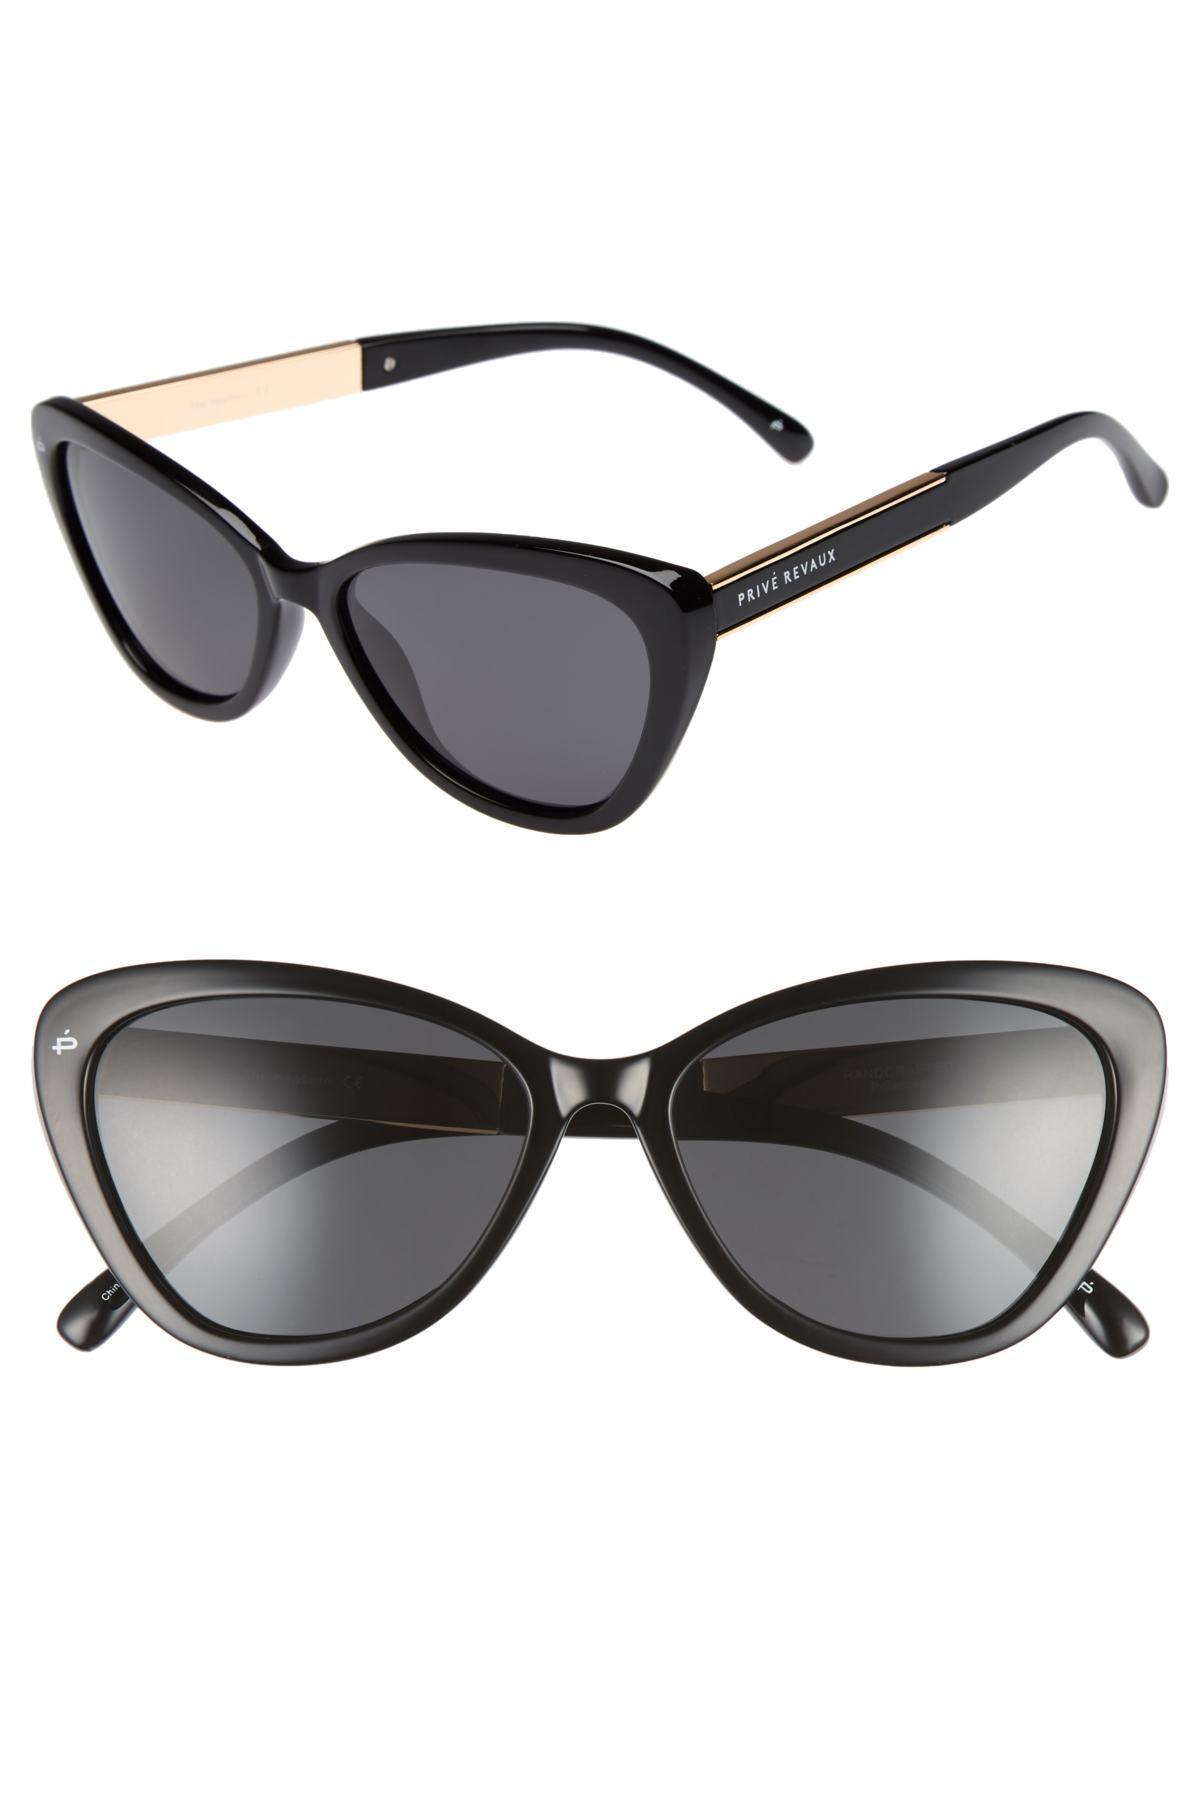 a7402c696bc Lyst - Privé Revaux The Hepburn 56mm Cat Eye Sunglasses in Black